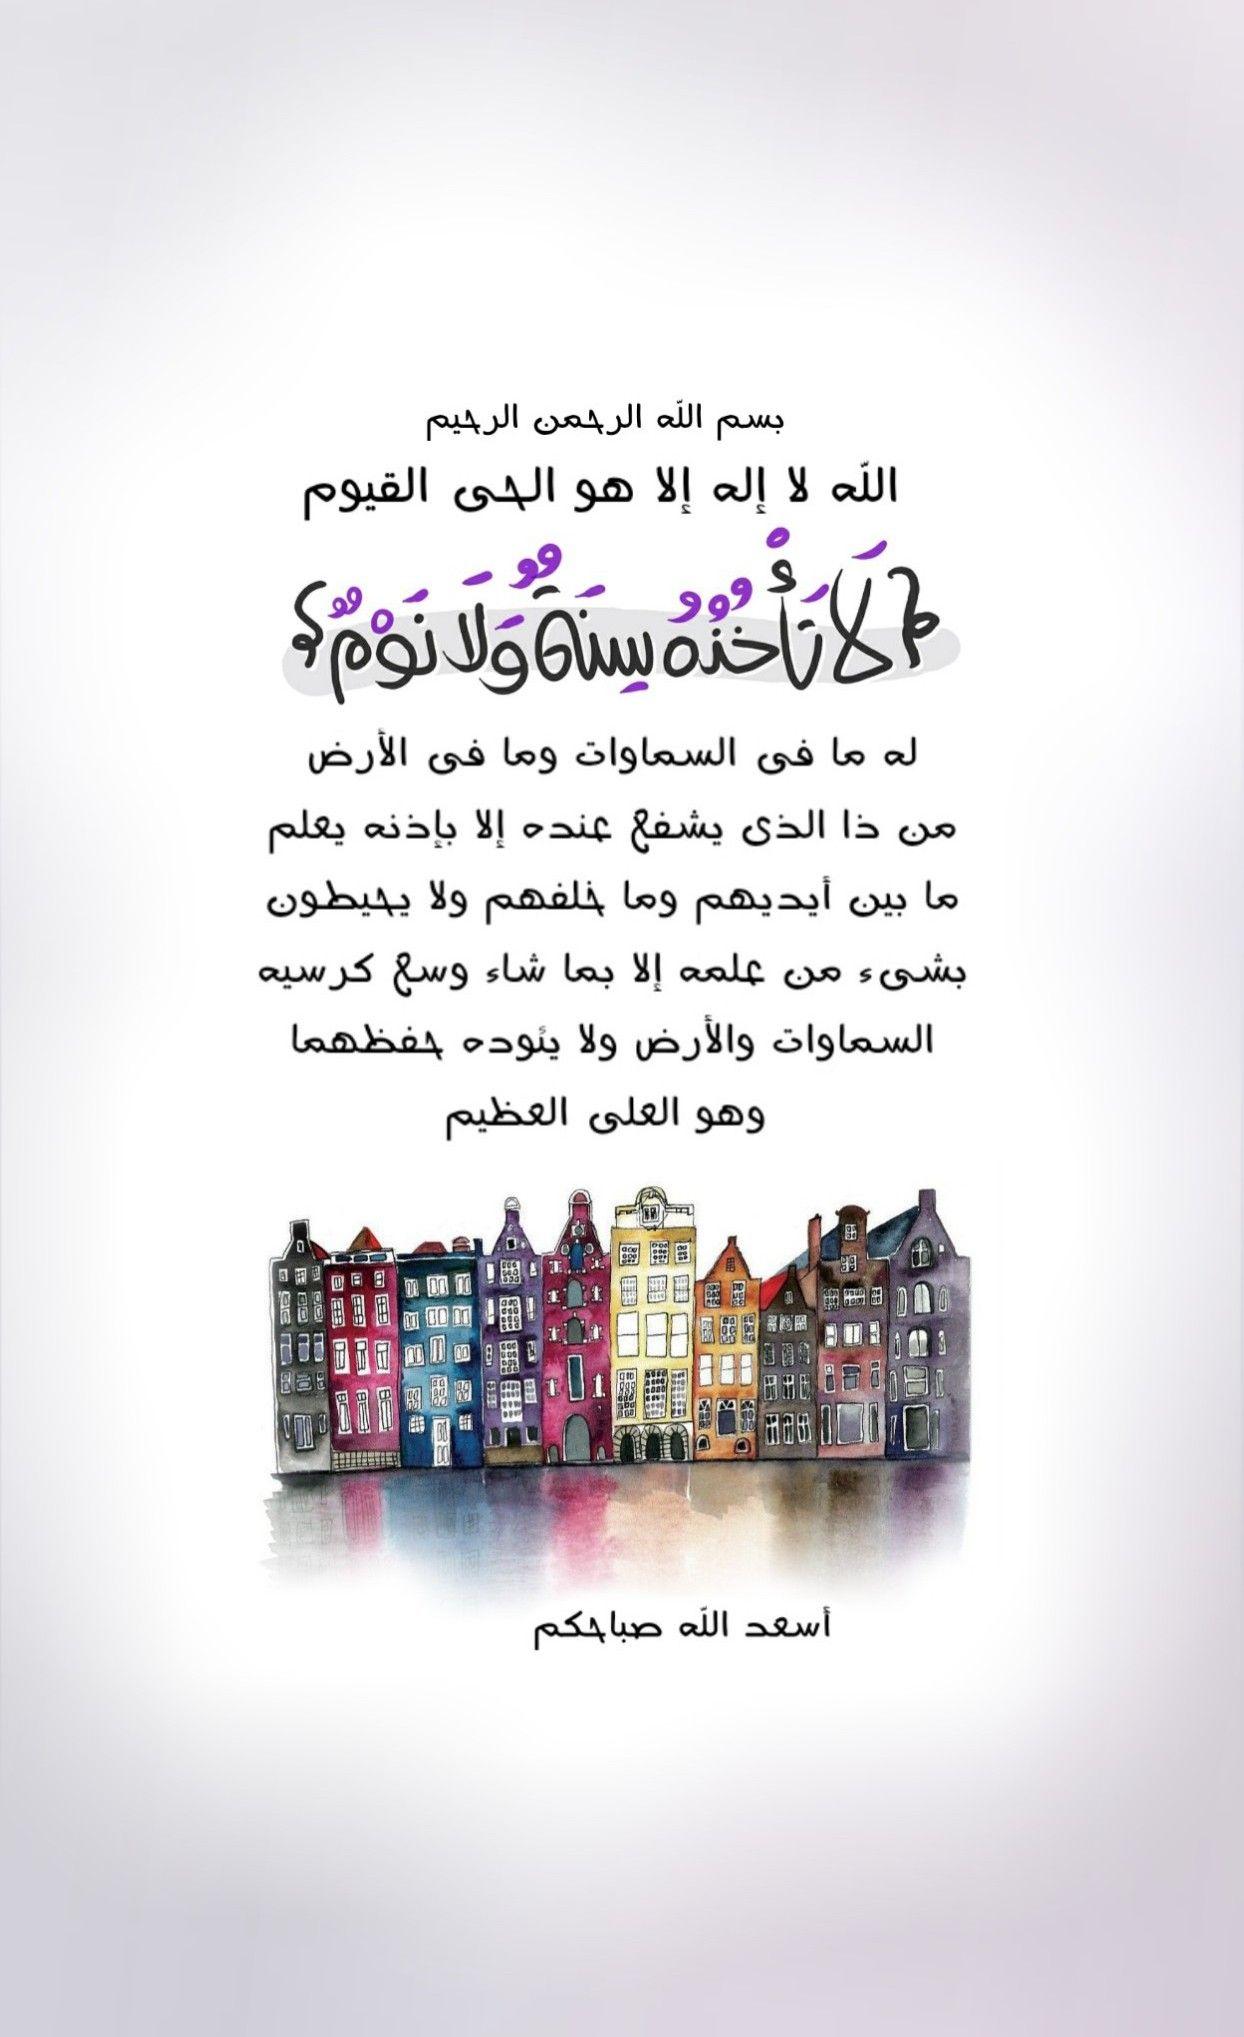 Beetlejuice Lydia Strange T Shirt Romantic Love Quotes Good Morning Greetings Quran Quotes